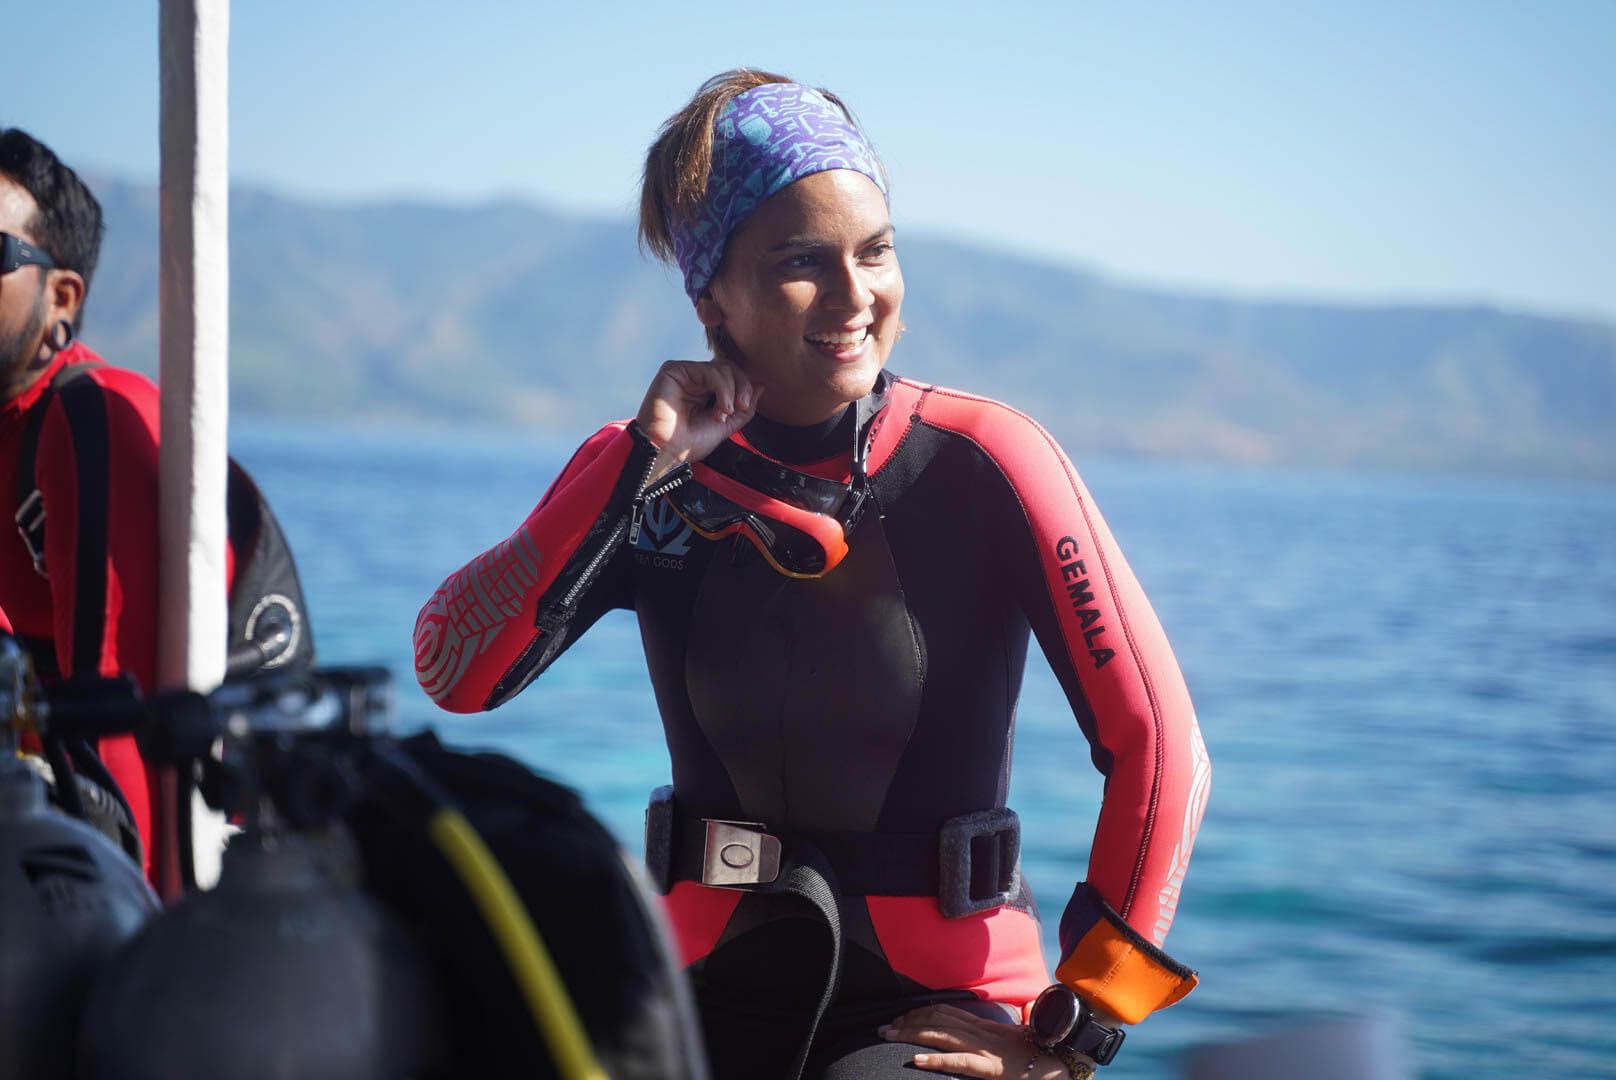 Gemala dan Kecintaannya pada Laut Indonesia